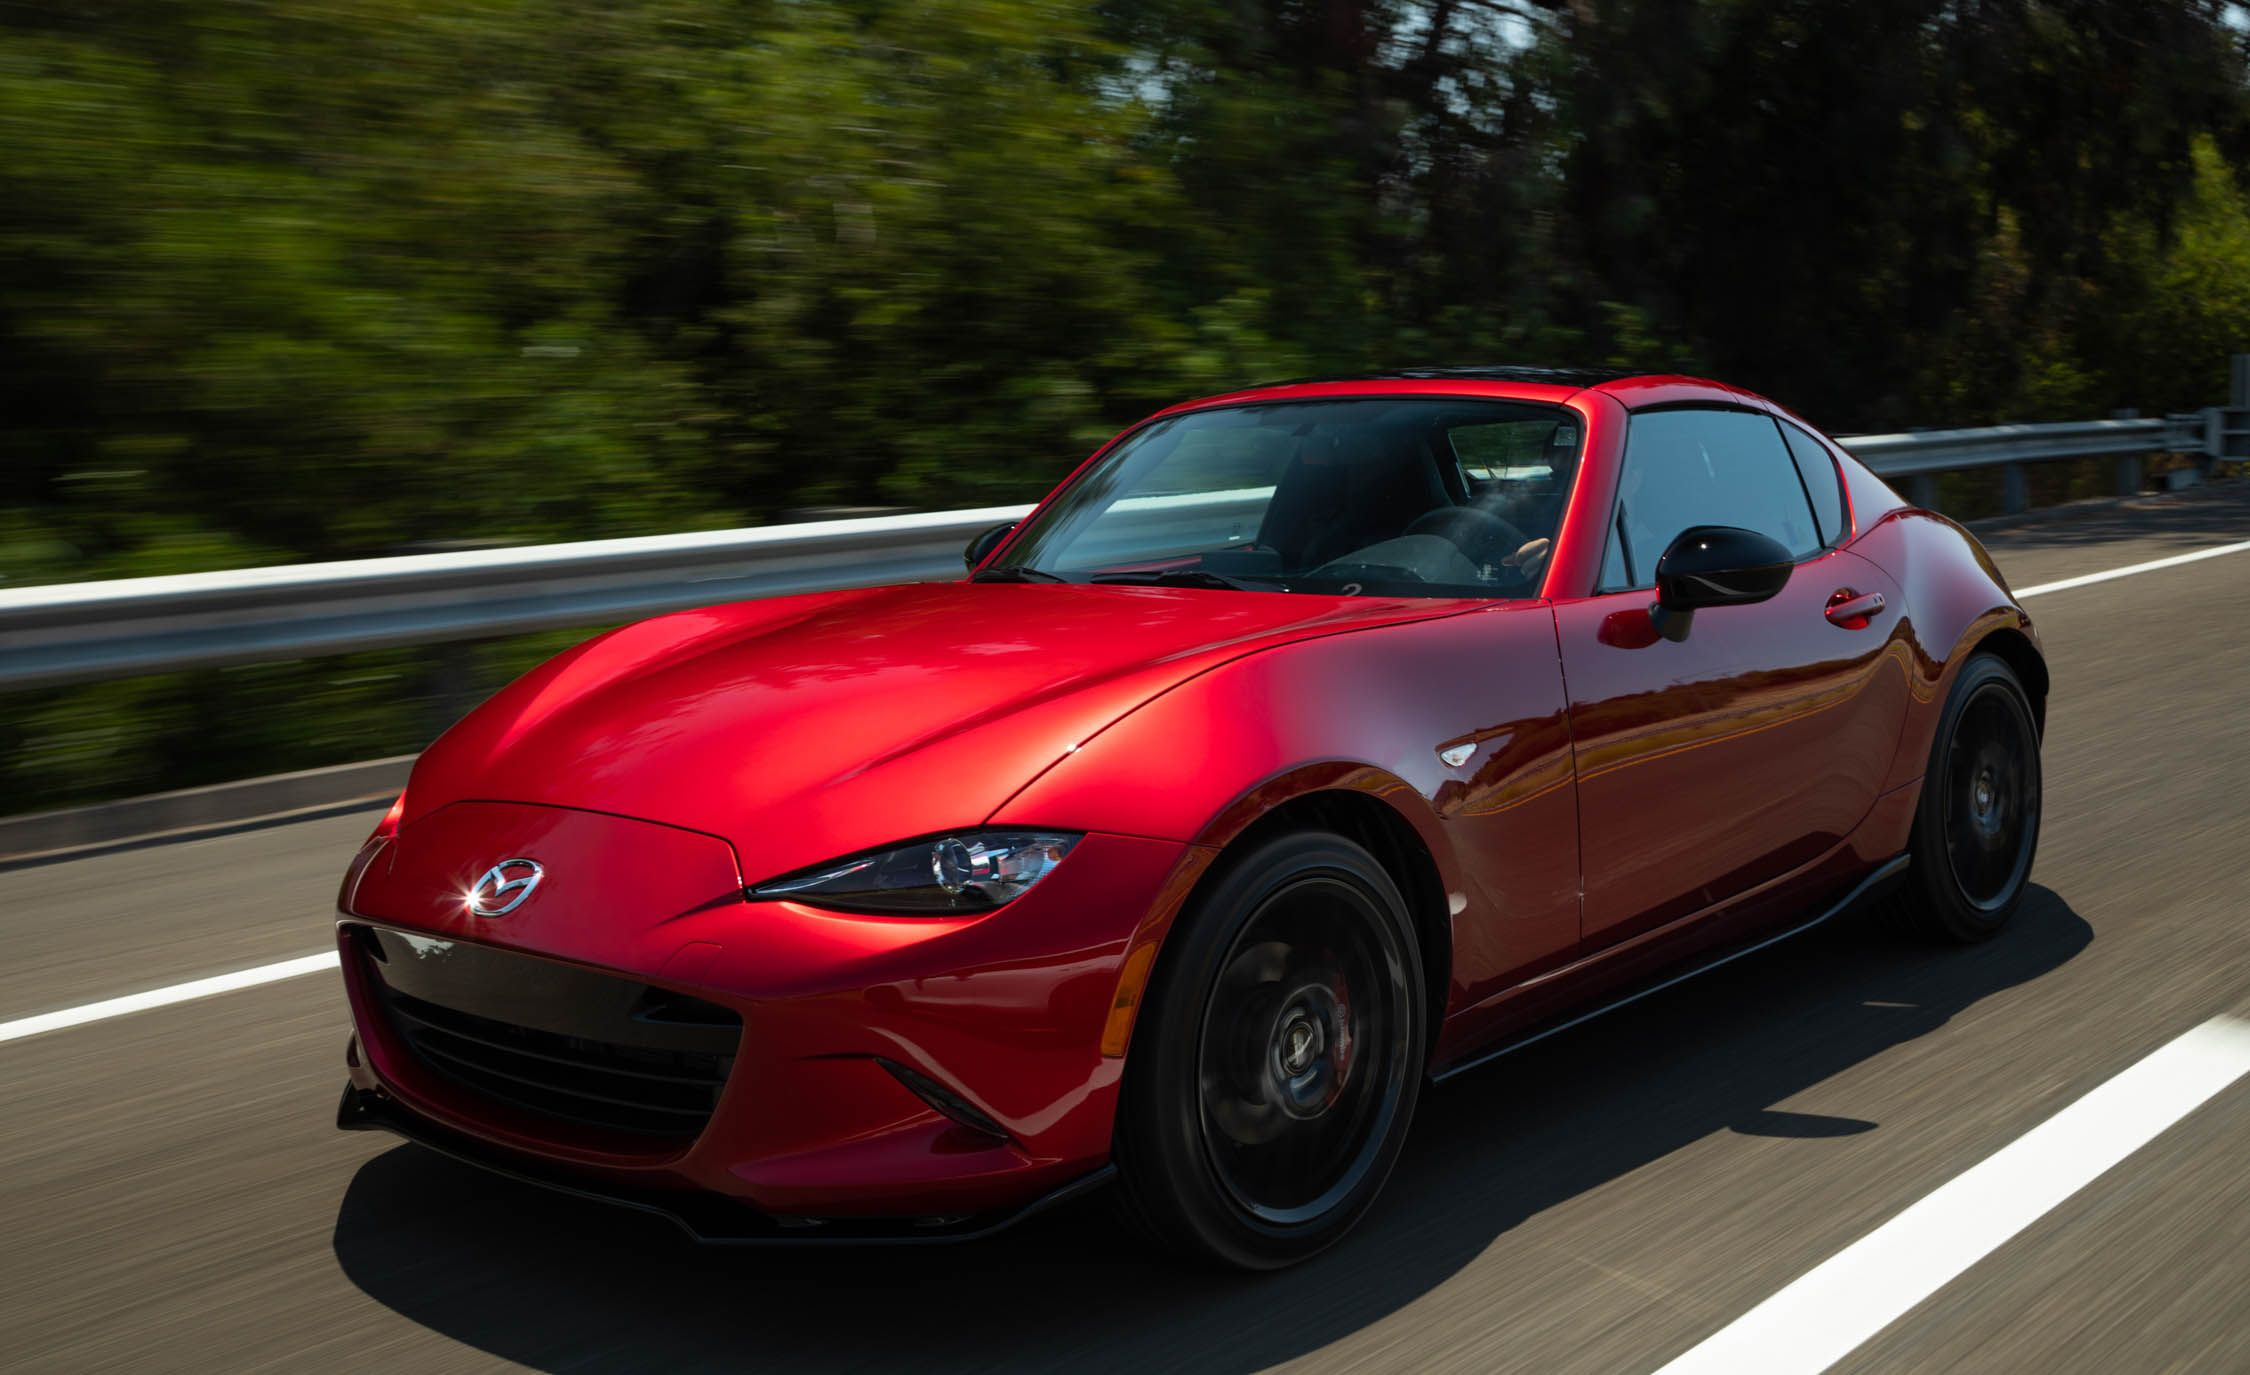 2019 mazda mx-5 miata: changes to the definitive sports car make it